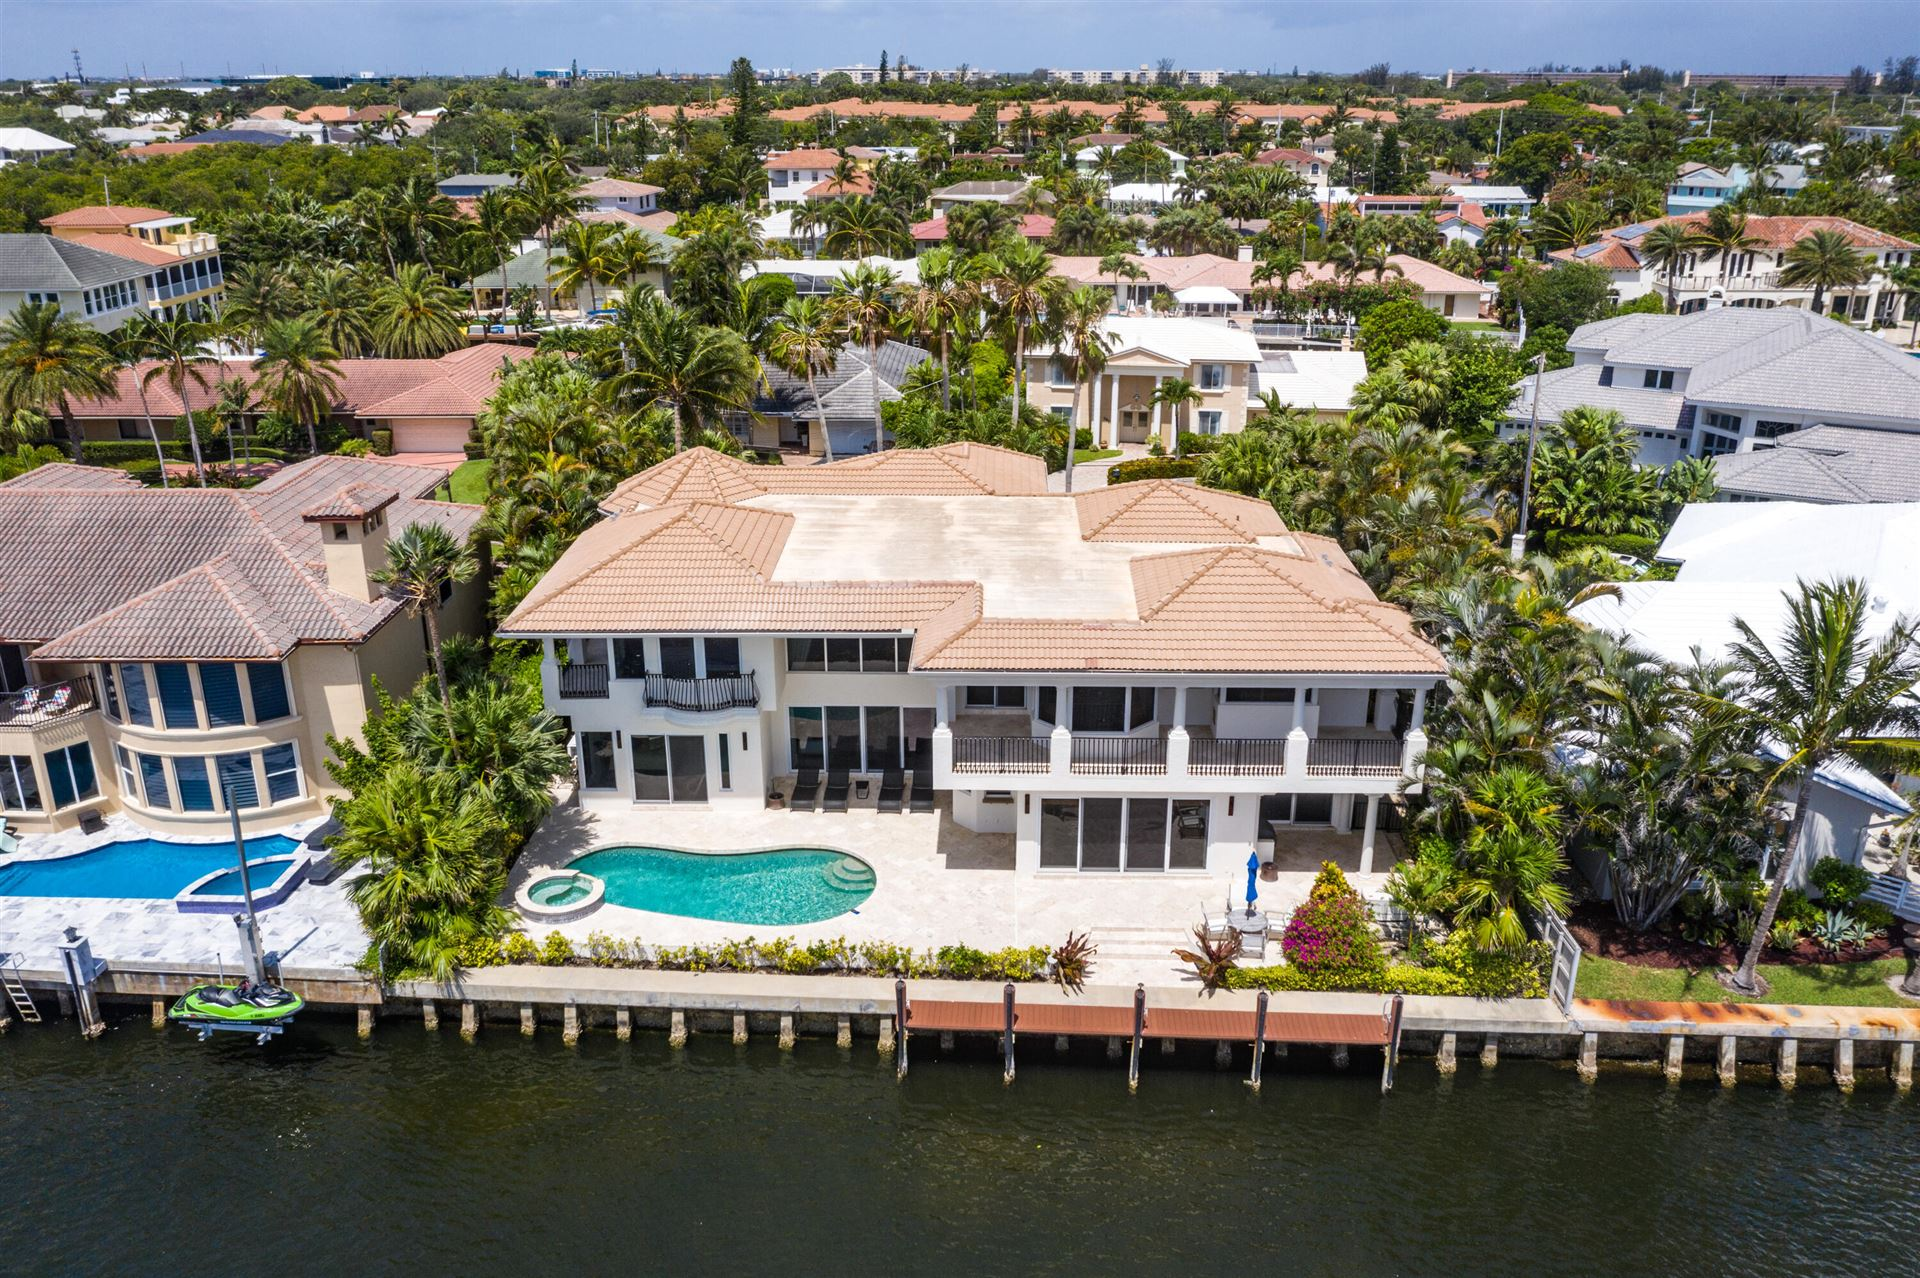 5600 Coastal Drive, Boca Raton, FL 33487 - #: RX-10718558